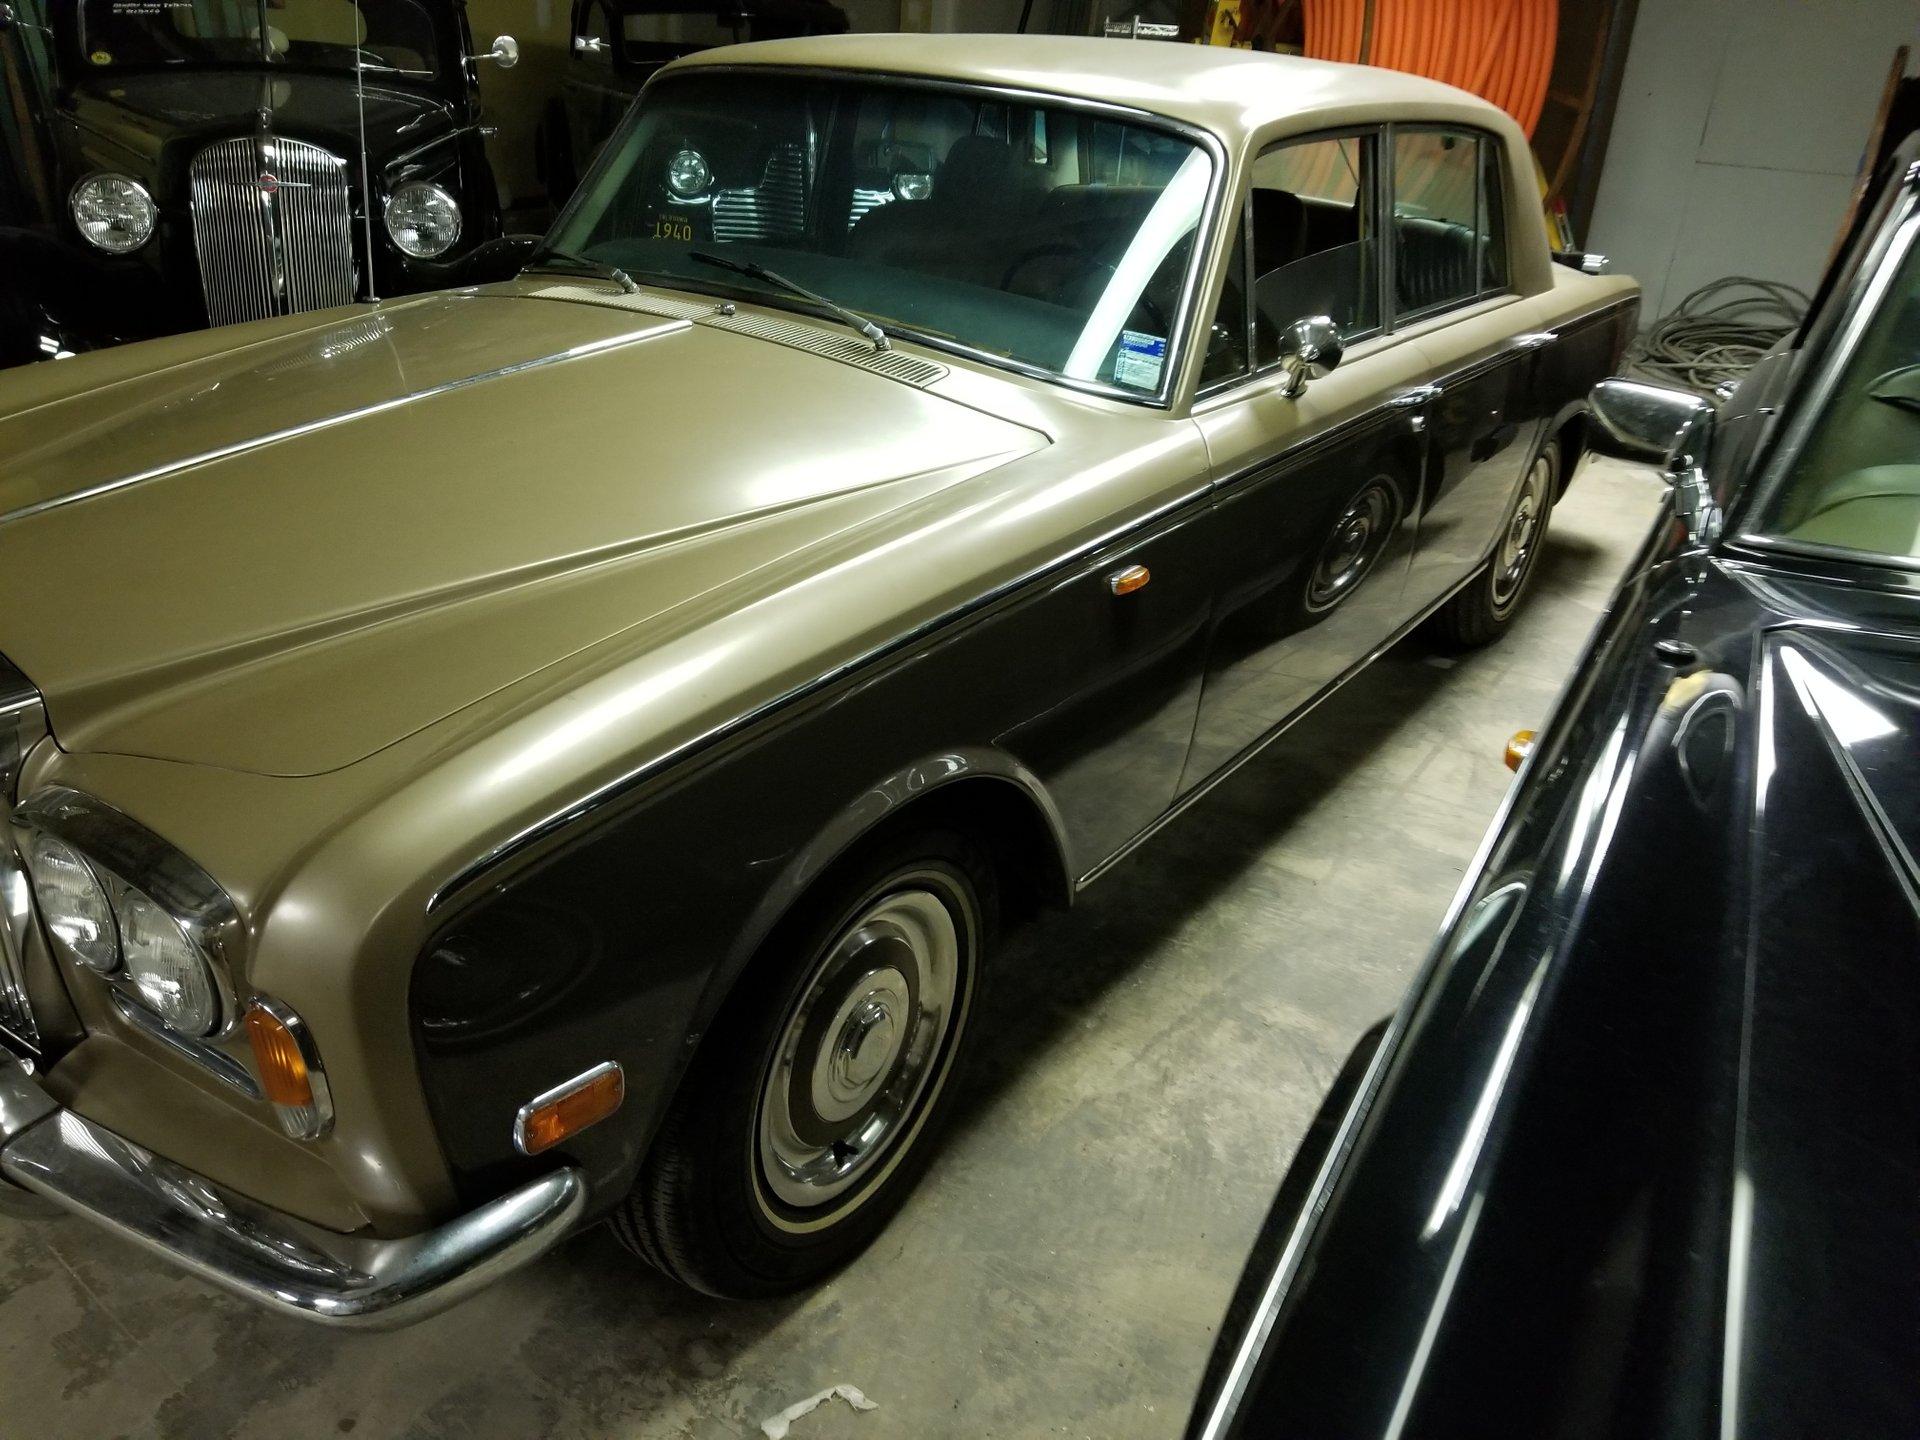 1979 rolls royce silver shadow ii saloon